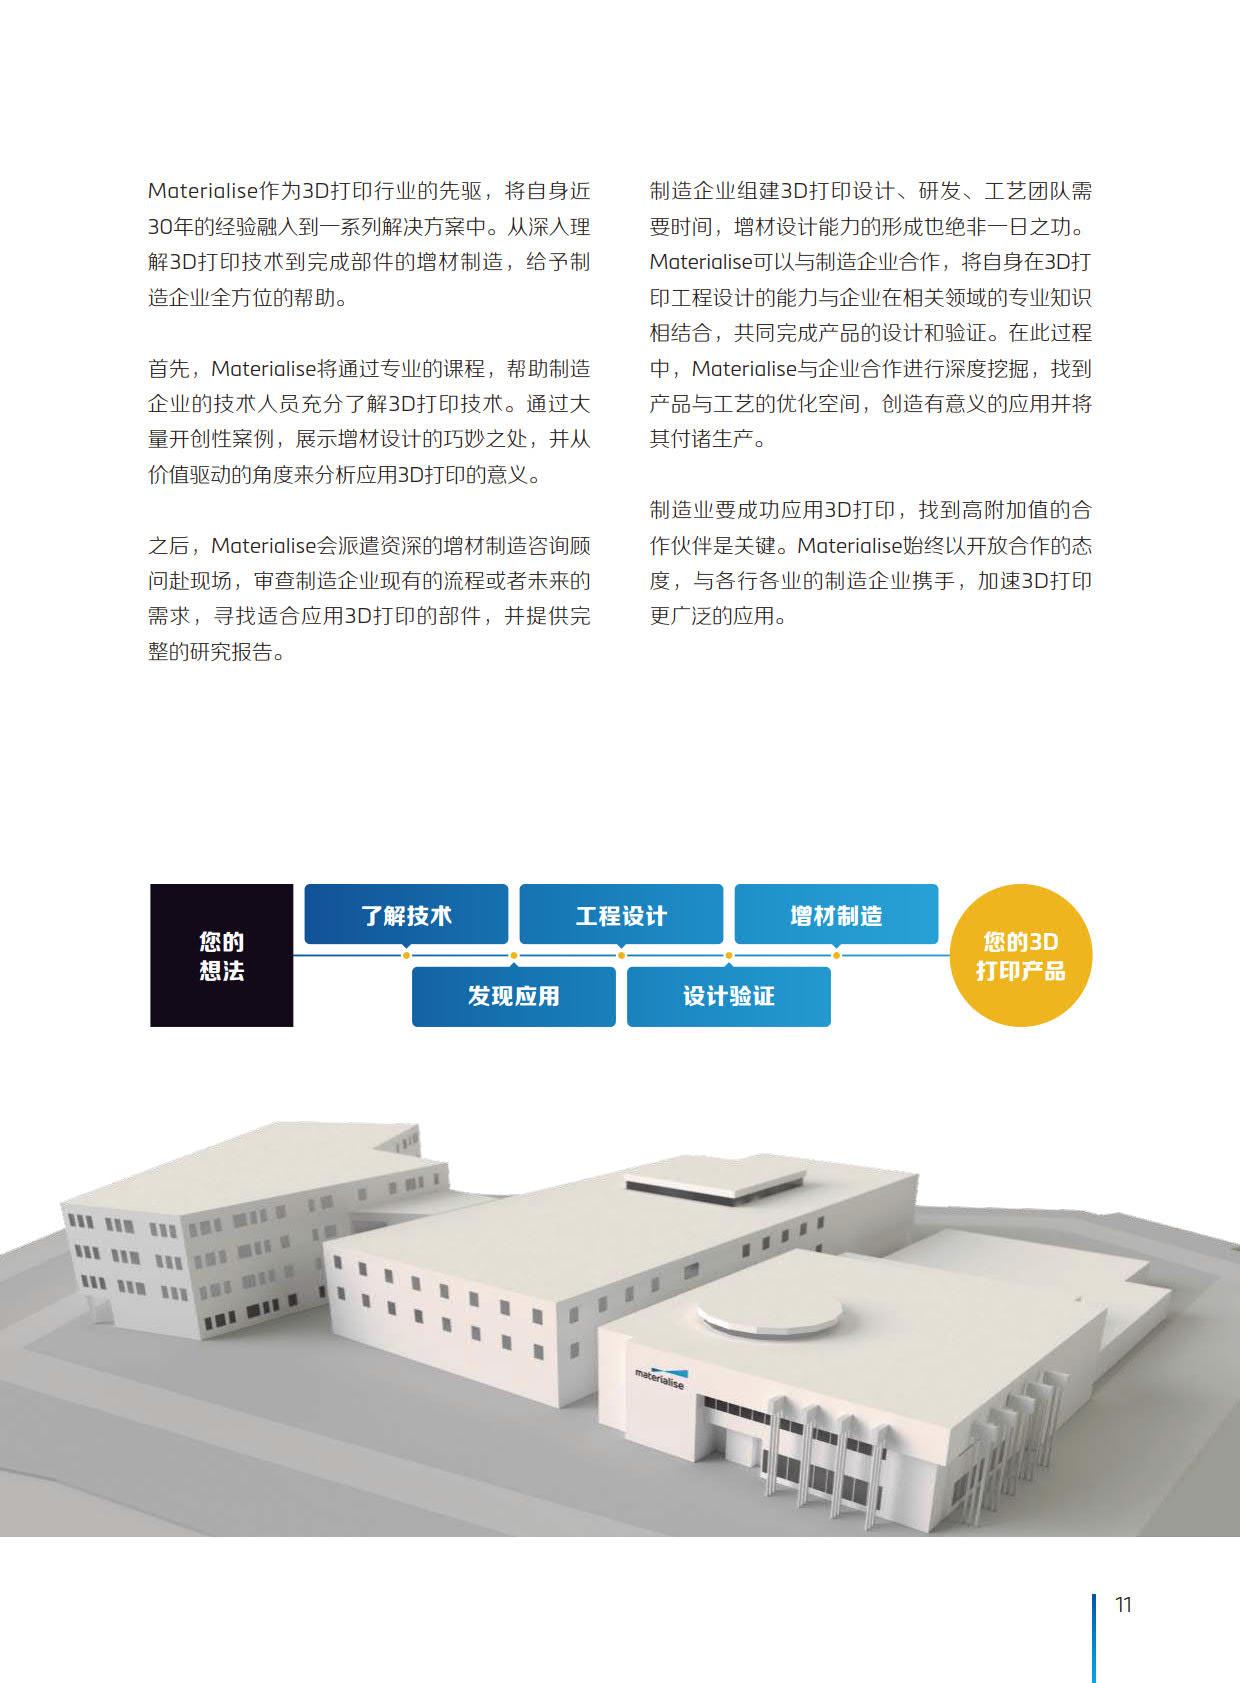 Materialise制造业调研报告_11.jpg